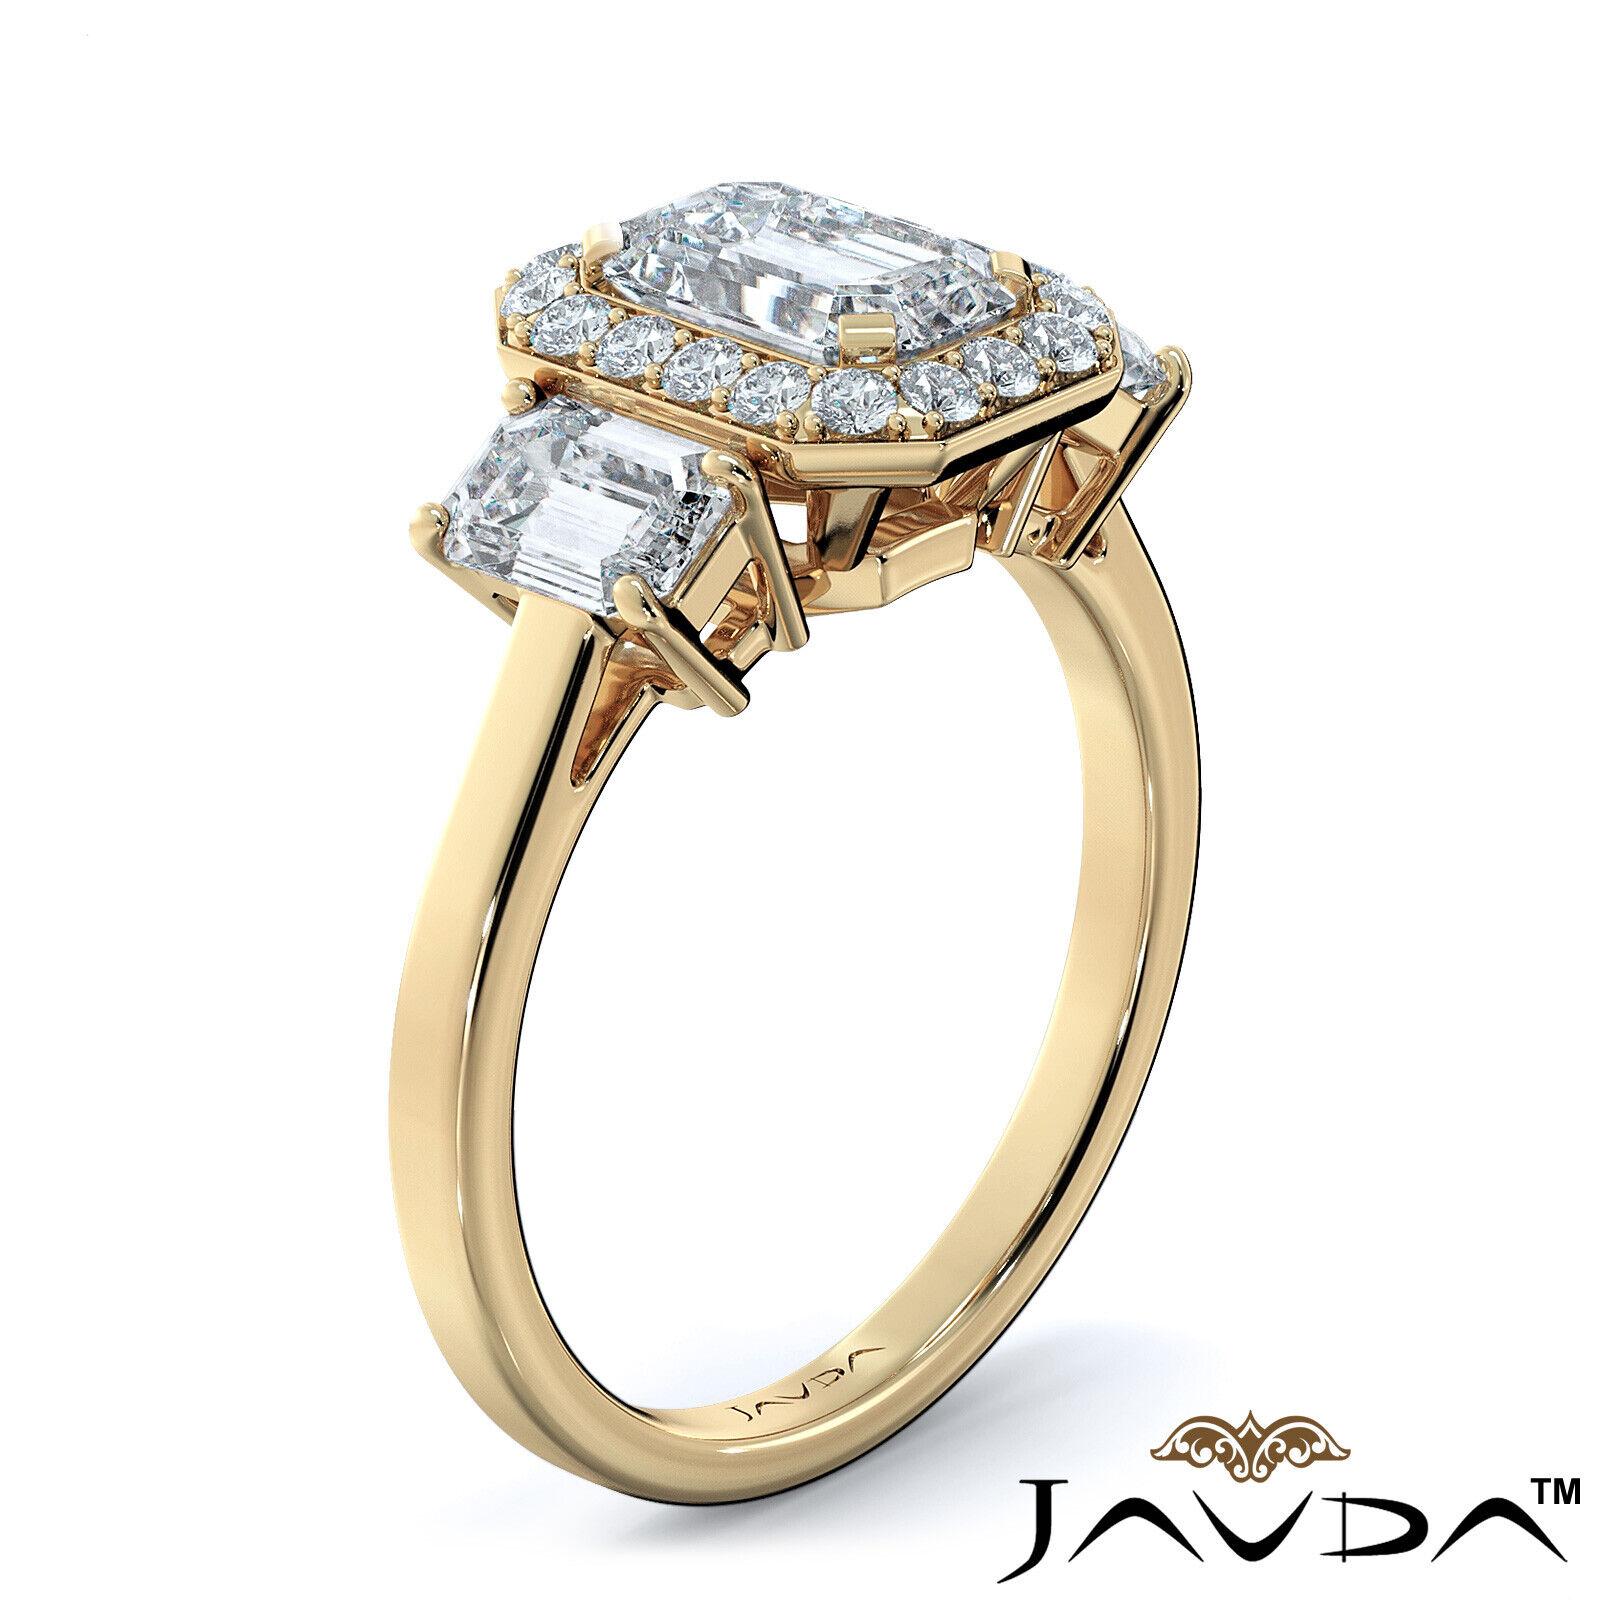 1.55ctw 3 Stone Halo Pave Emerald Diamond Engagement Ring GIA F-SI2 White Gold 9